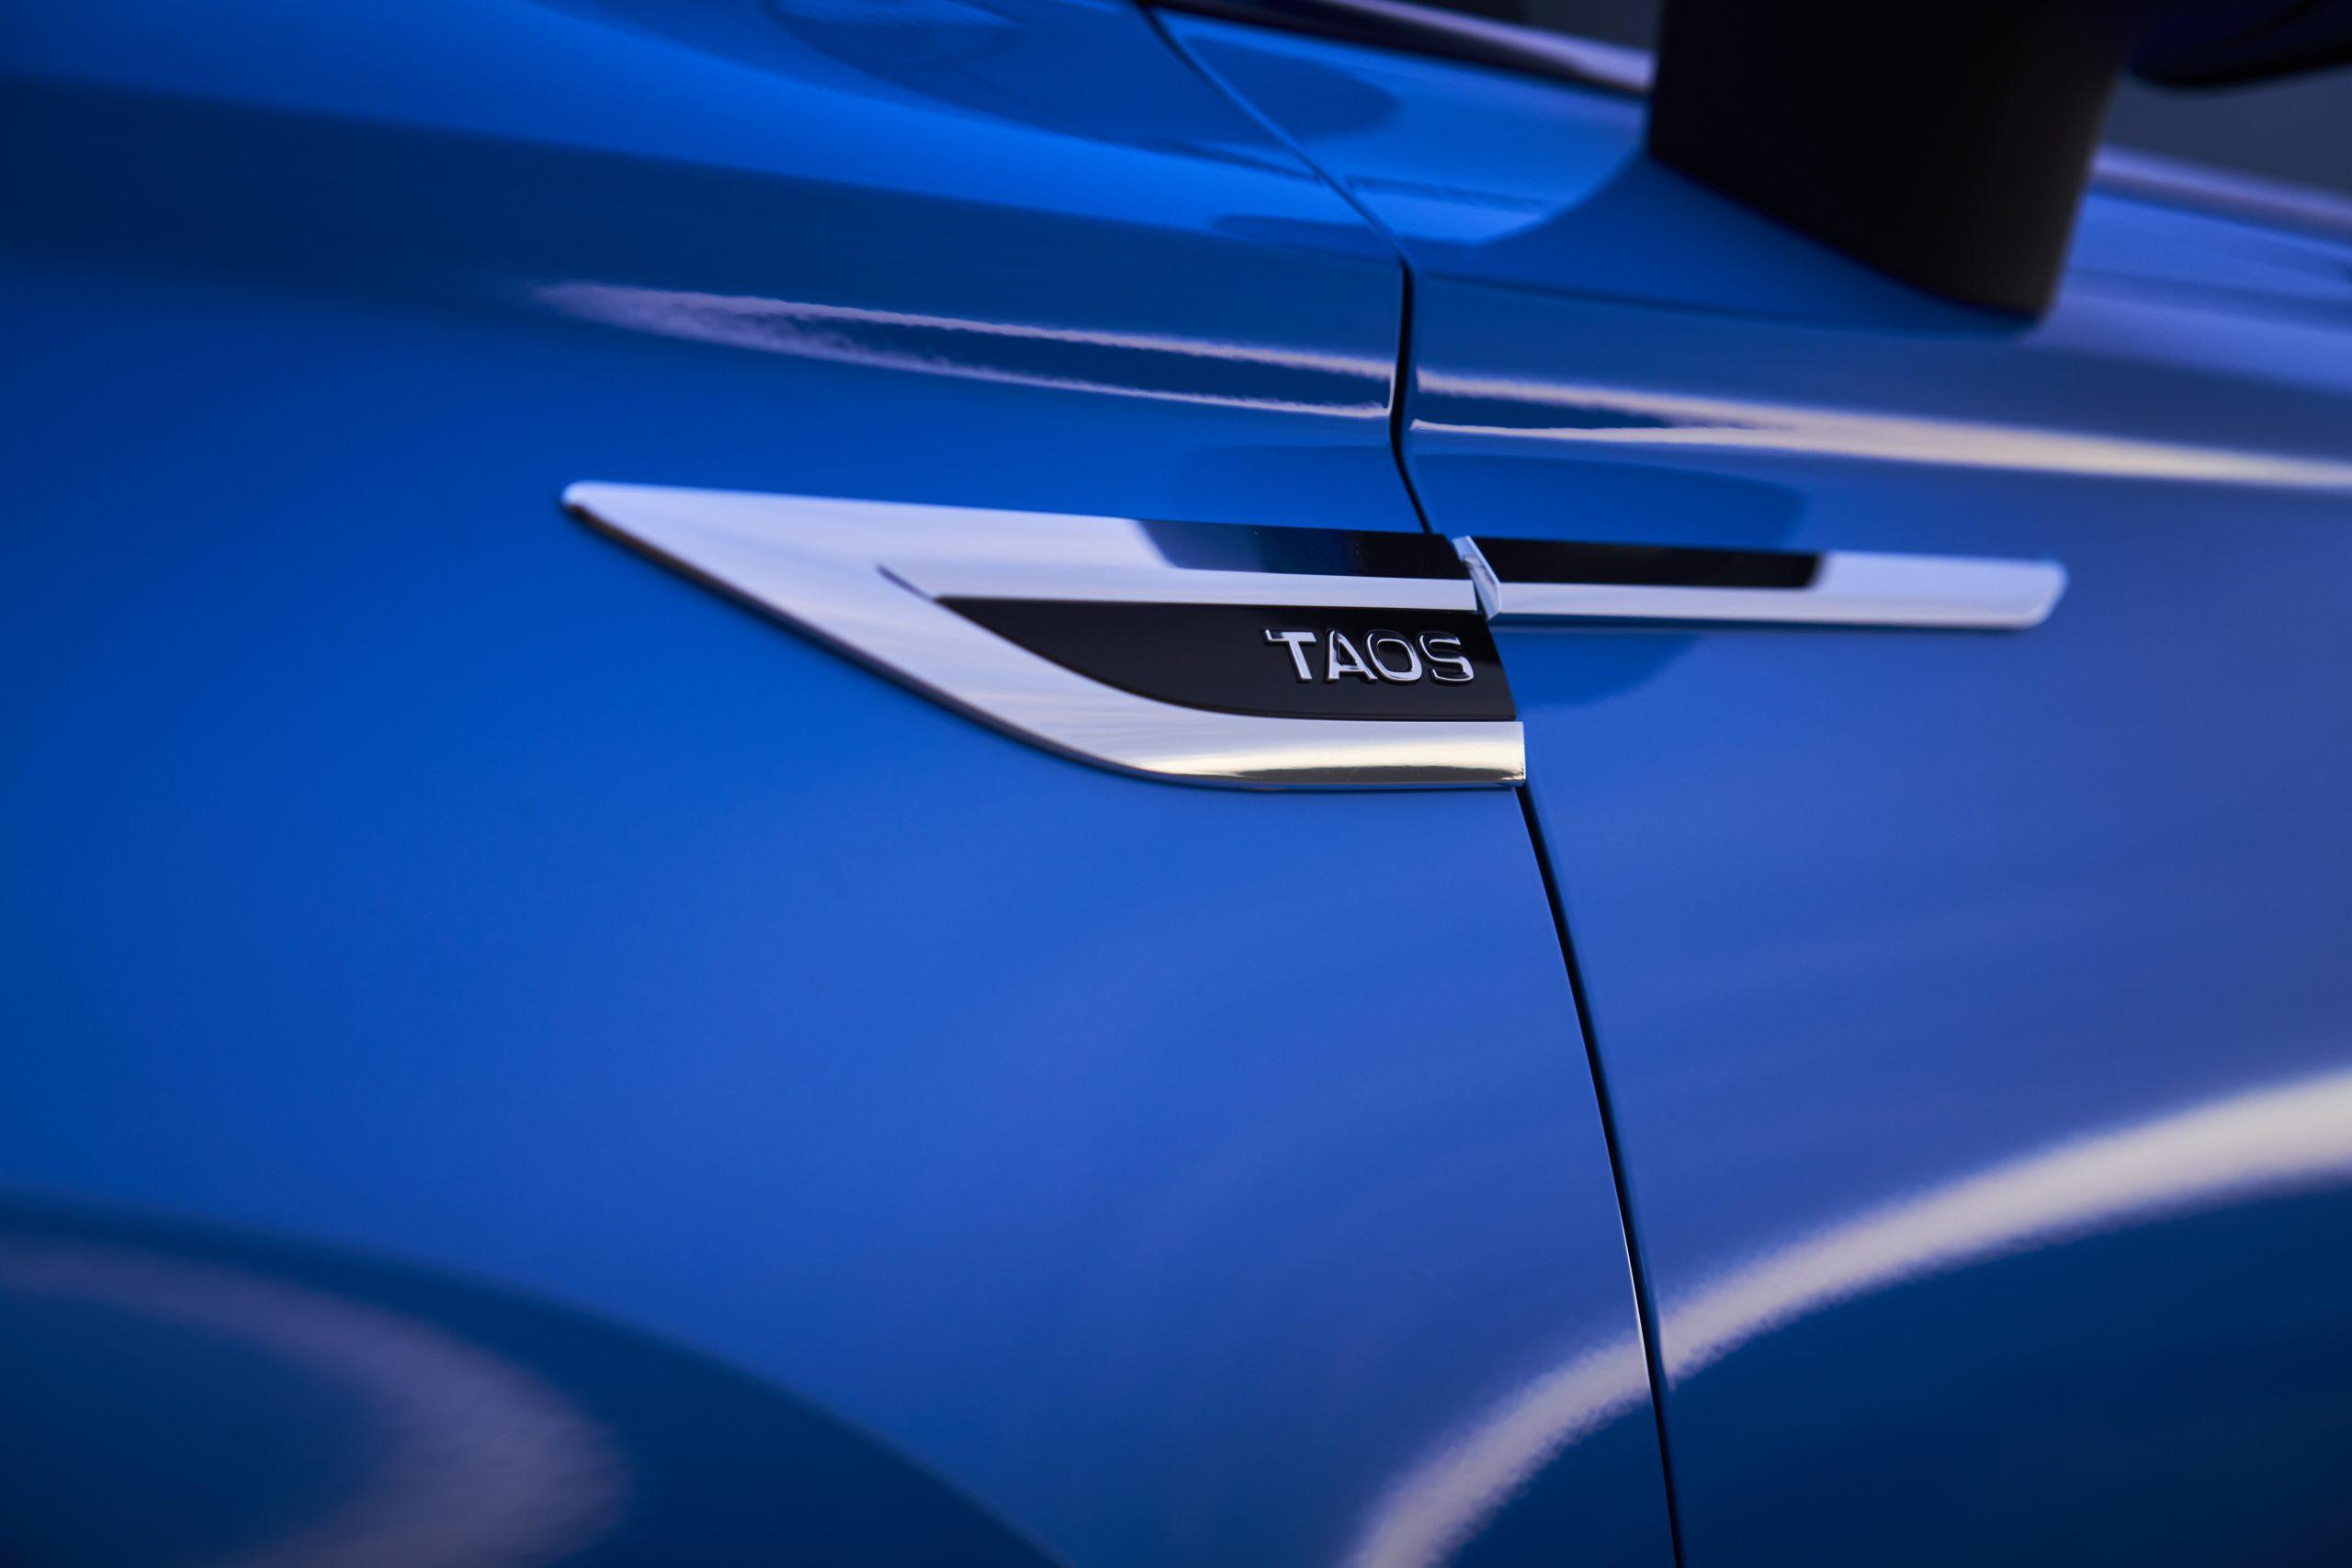 2022 Volkswagen Taos nameplate detail